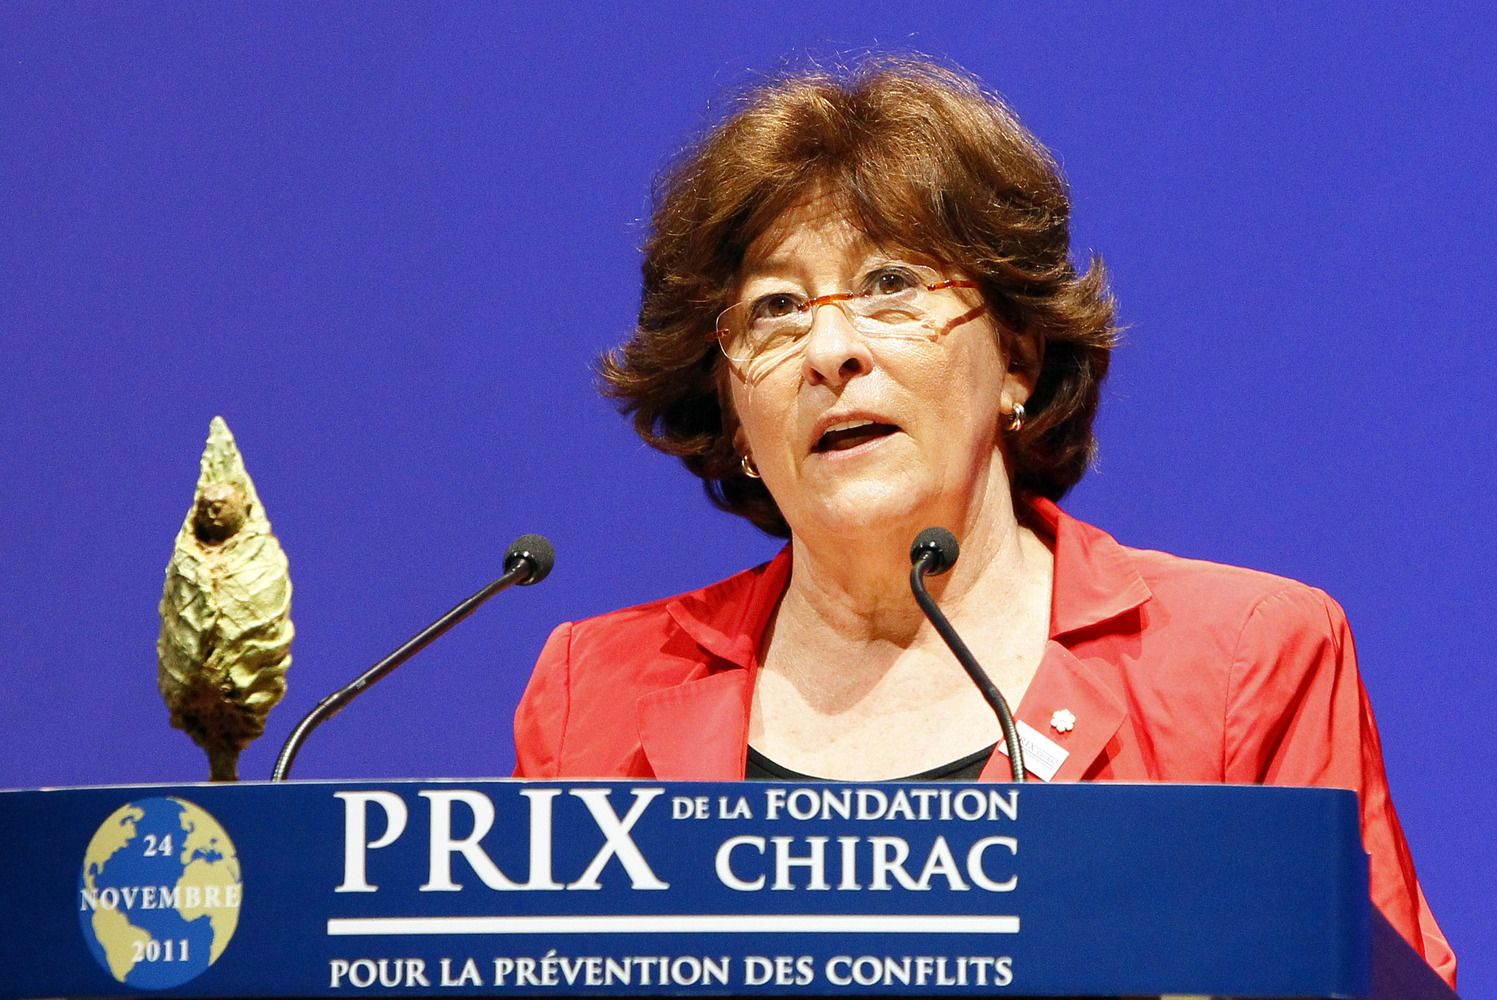 Louise Arbour – JT prokurorė, nuvertusi karo generolus